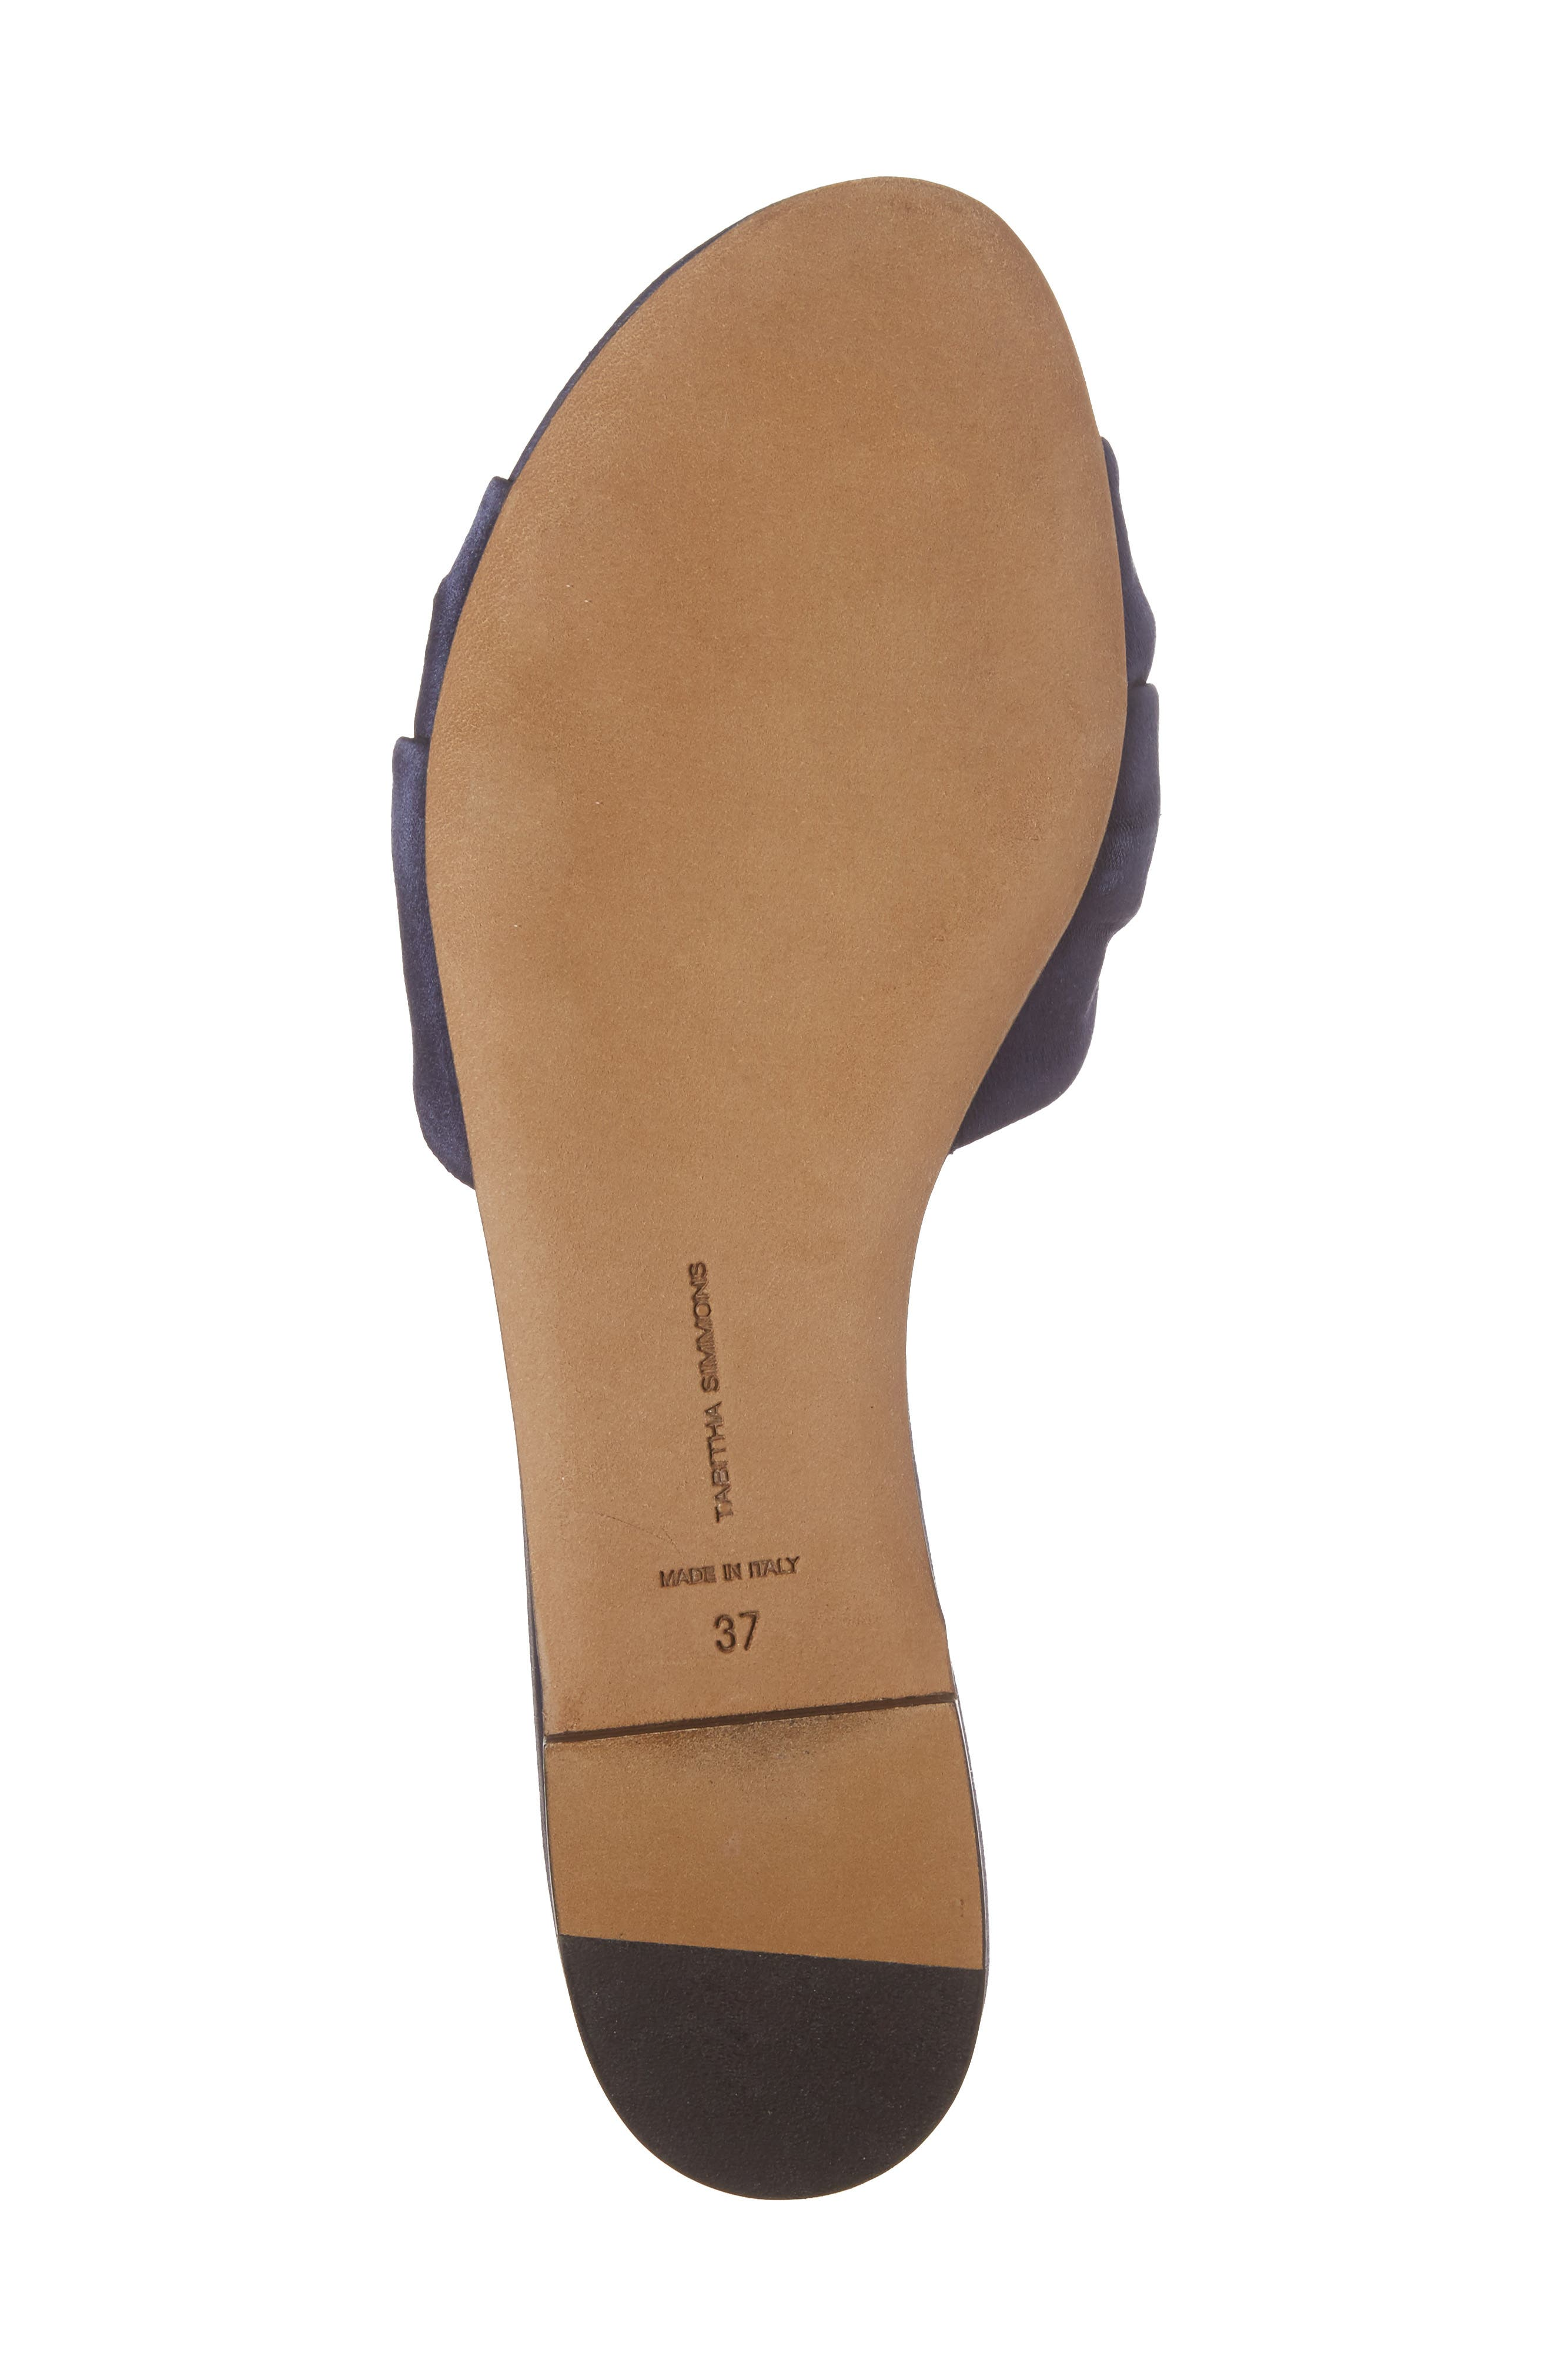 Cleo Knotted Bow Slide Sandal,                             Alternate thumbnail 6, color,                             Navy